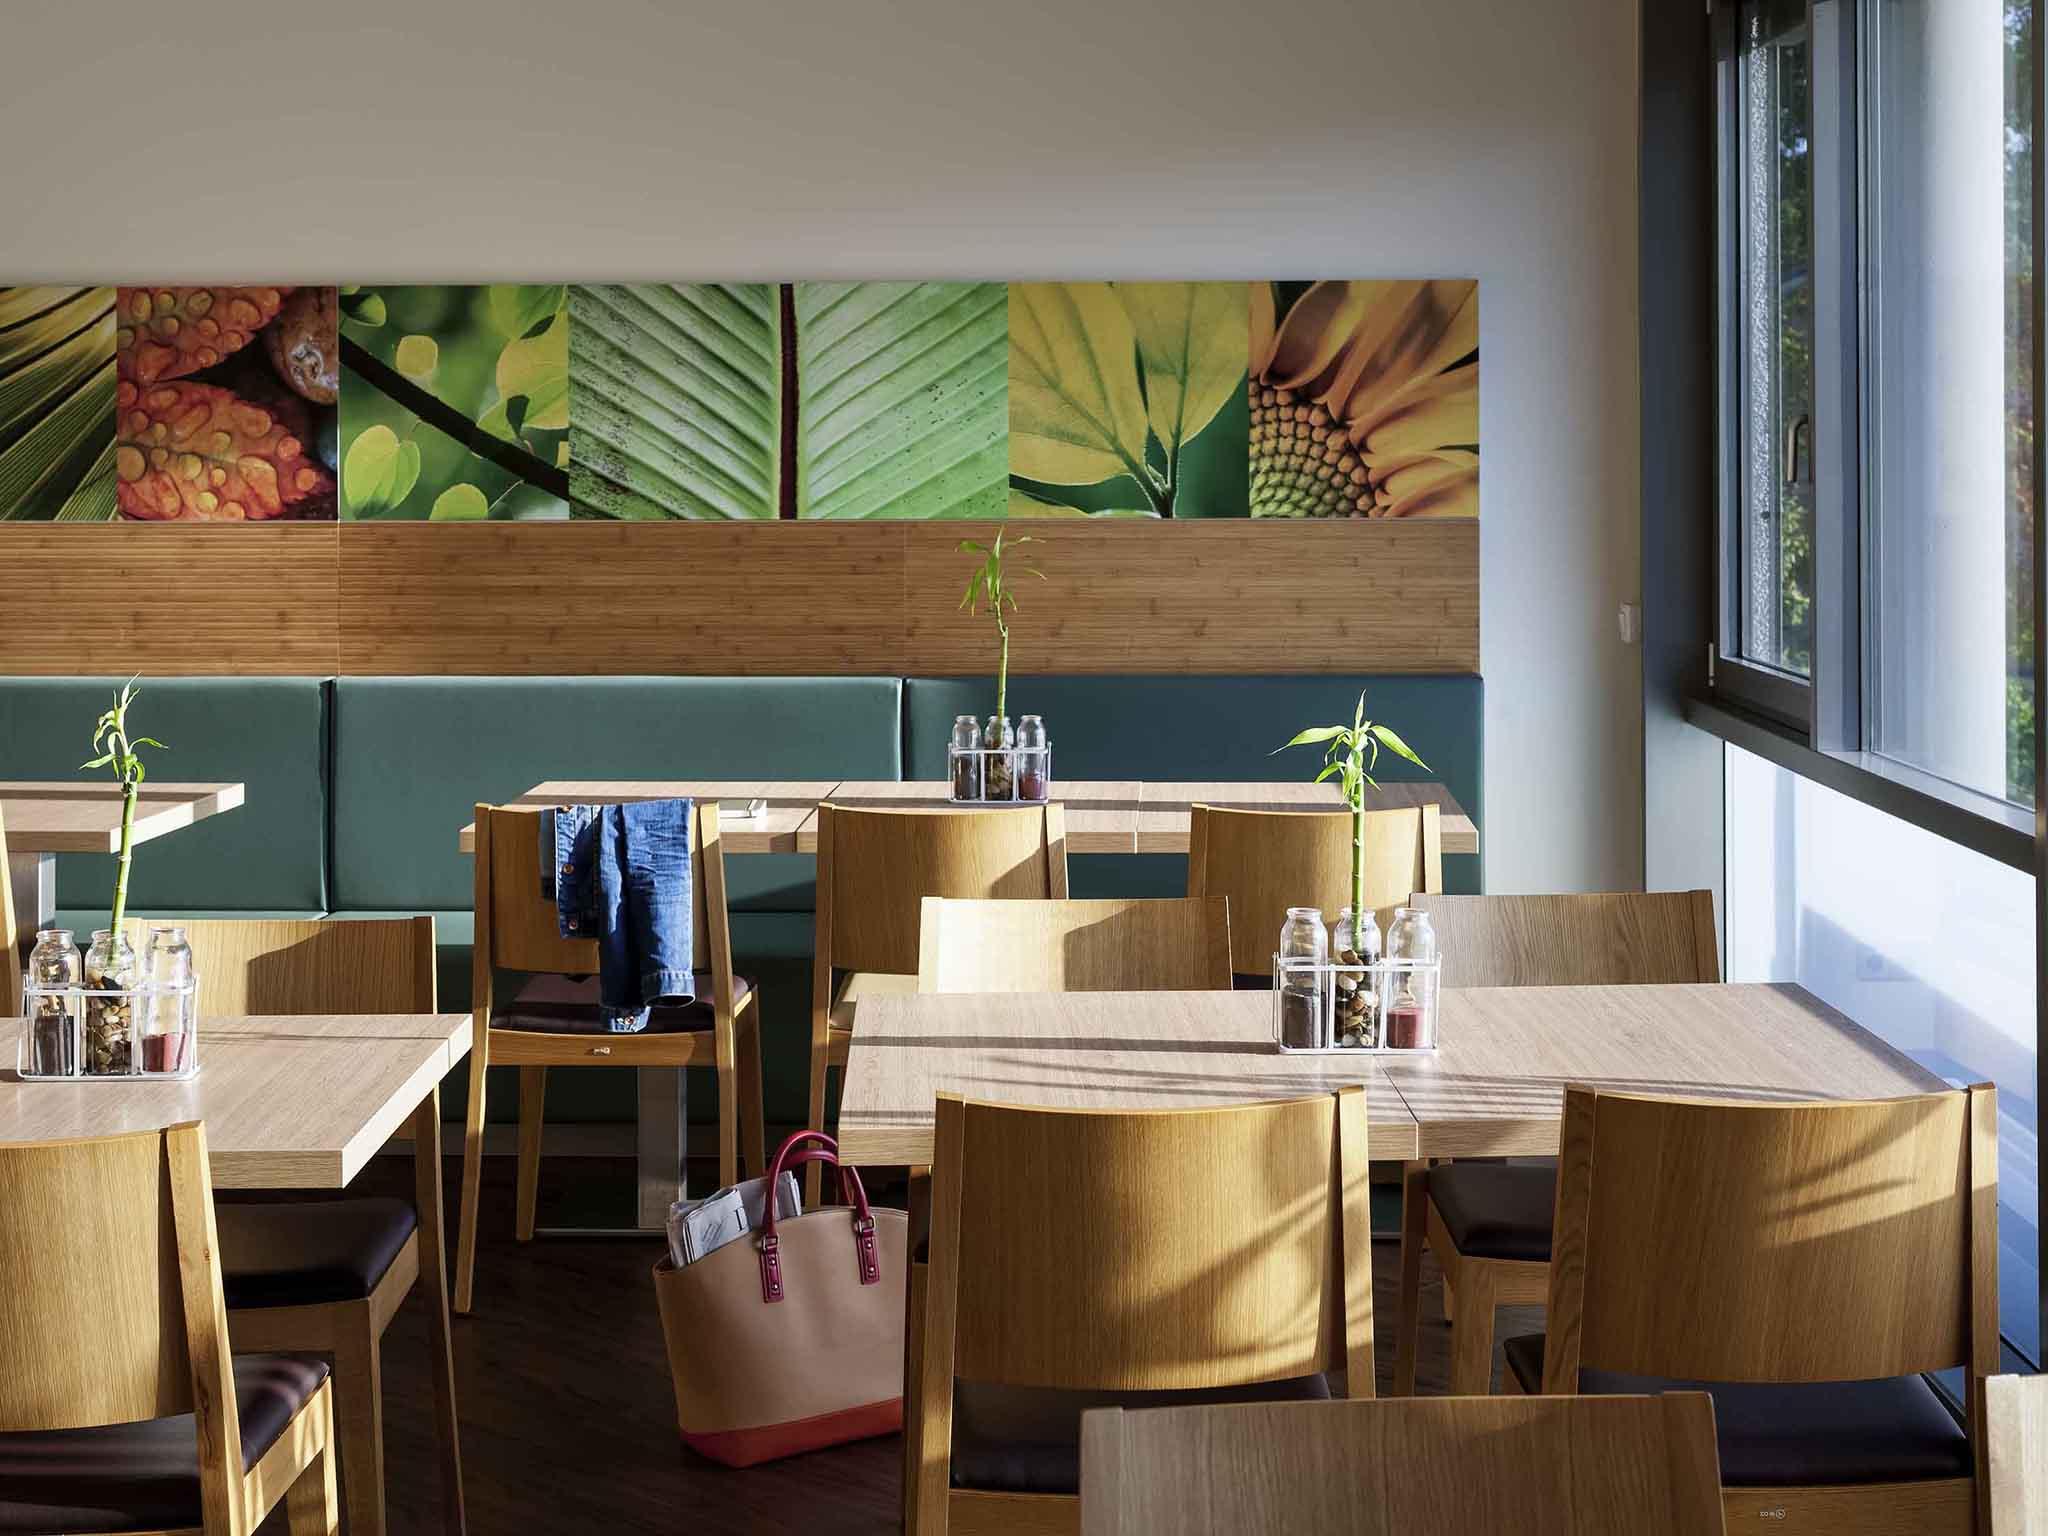 Gunstiges Hotel Berlin Prenzlauer Berg Ibis Accor